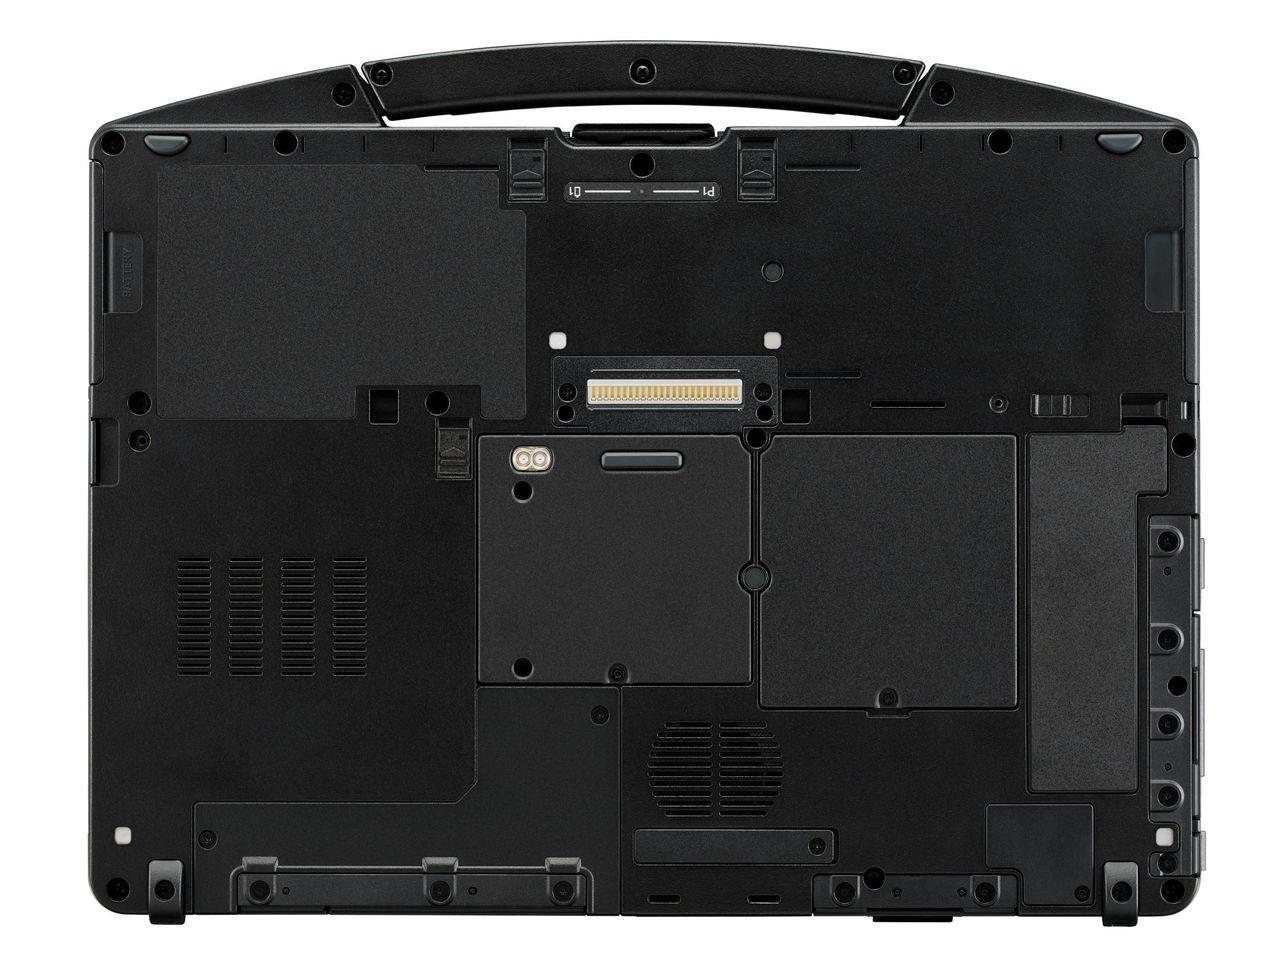 Panasonic FZ-55 back